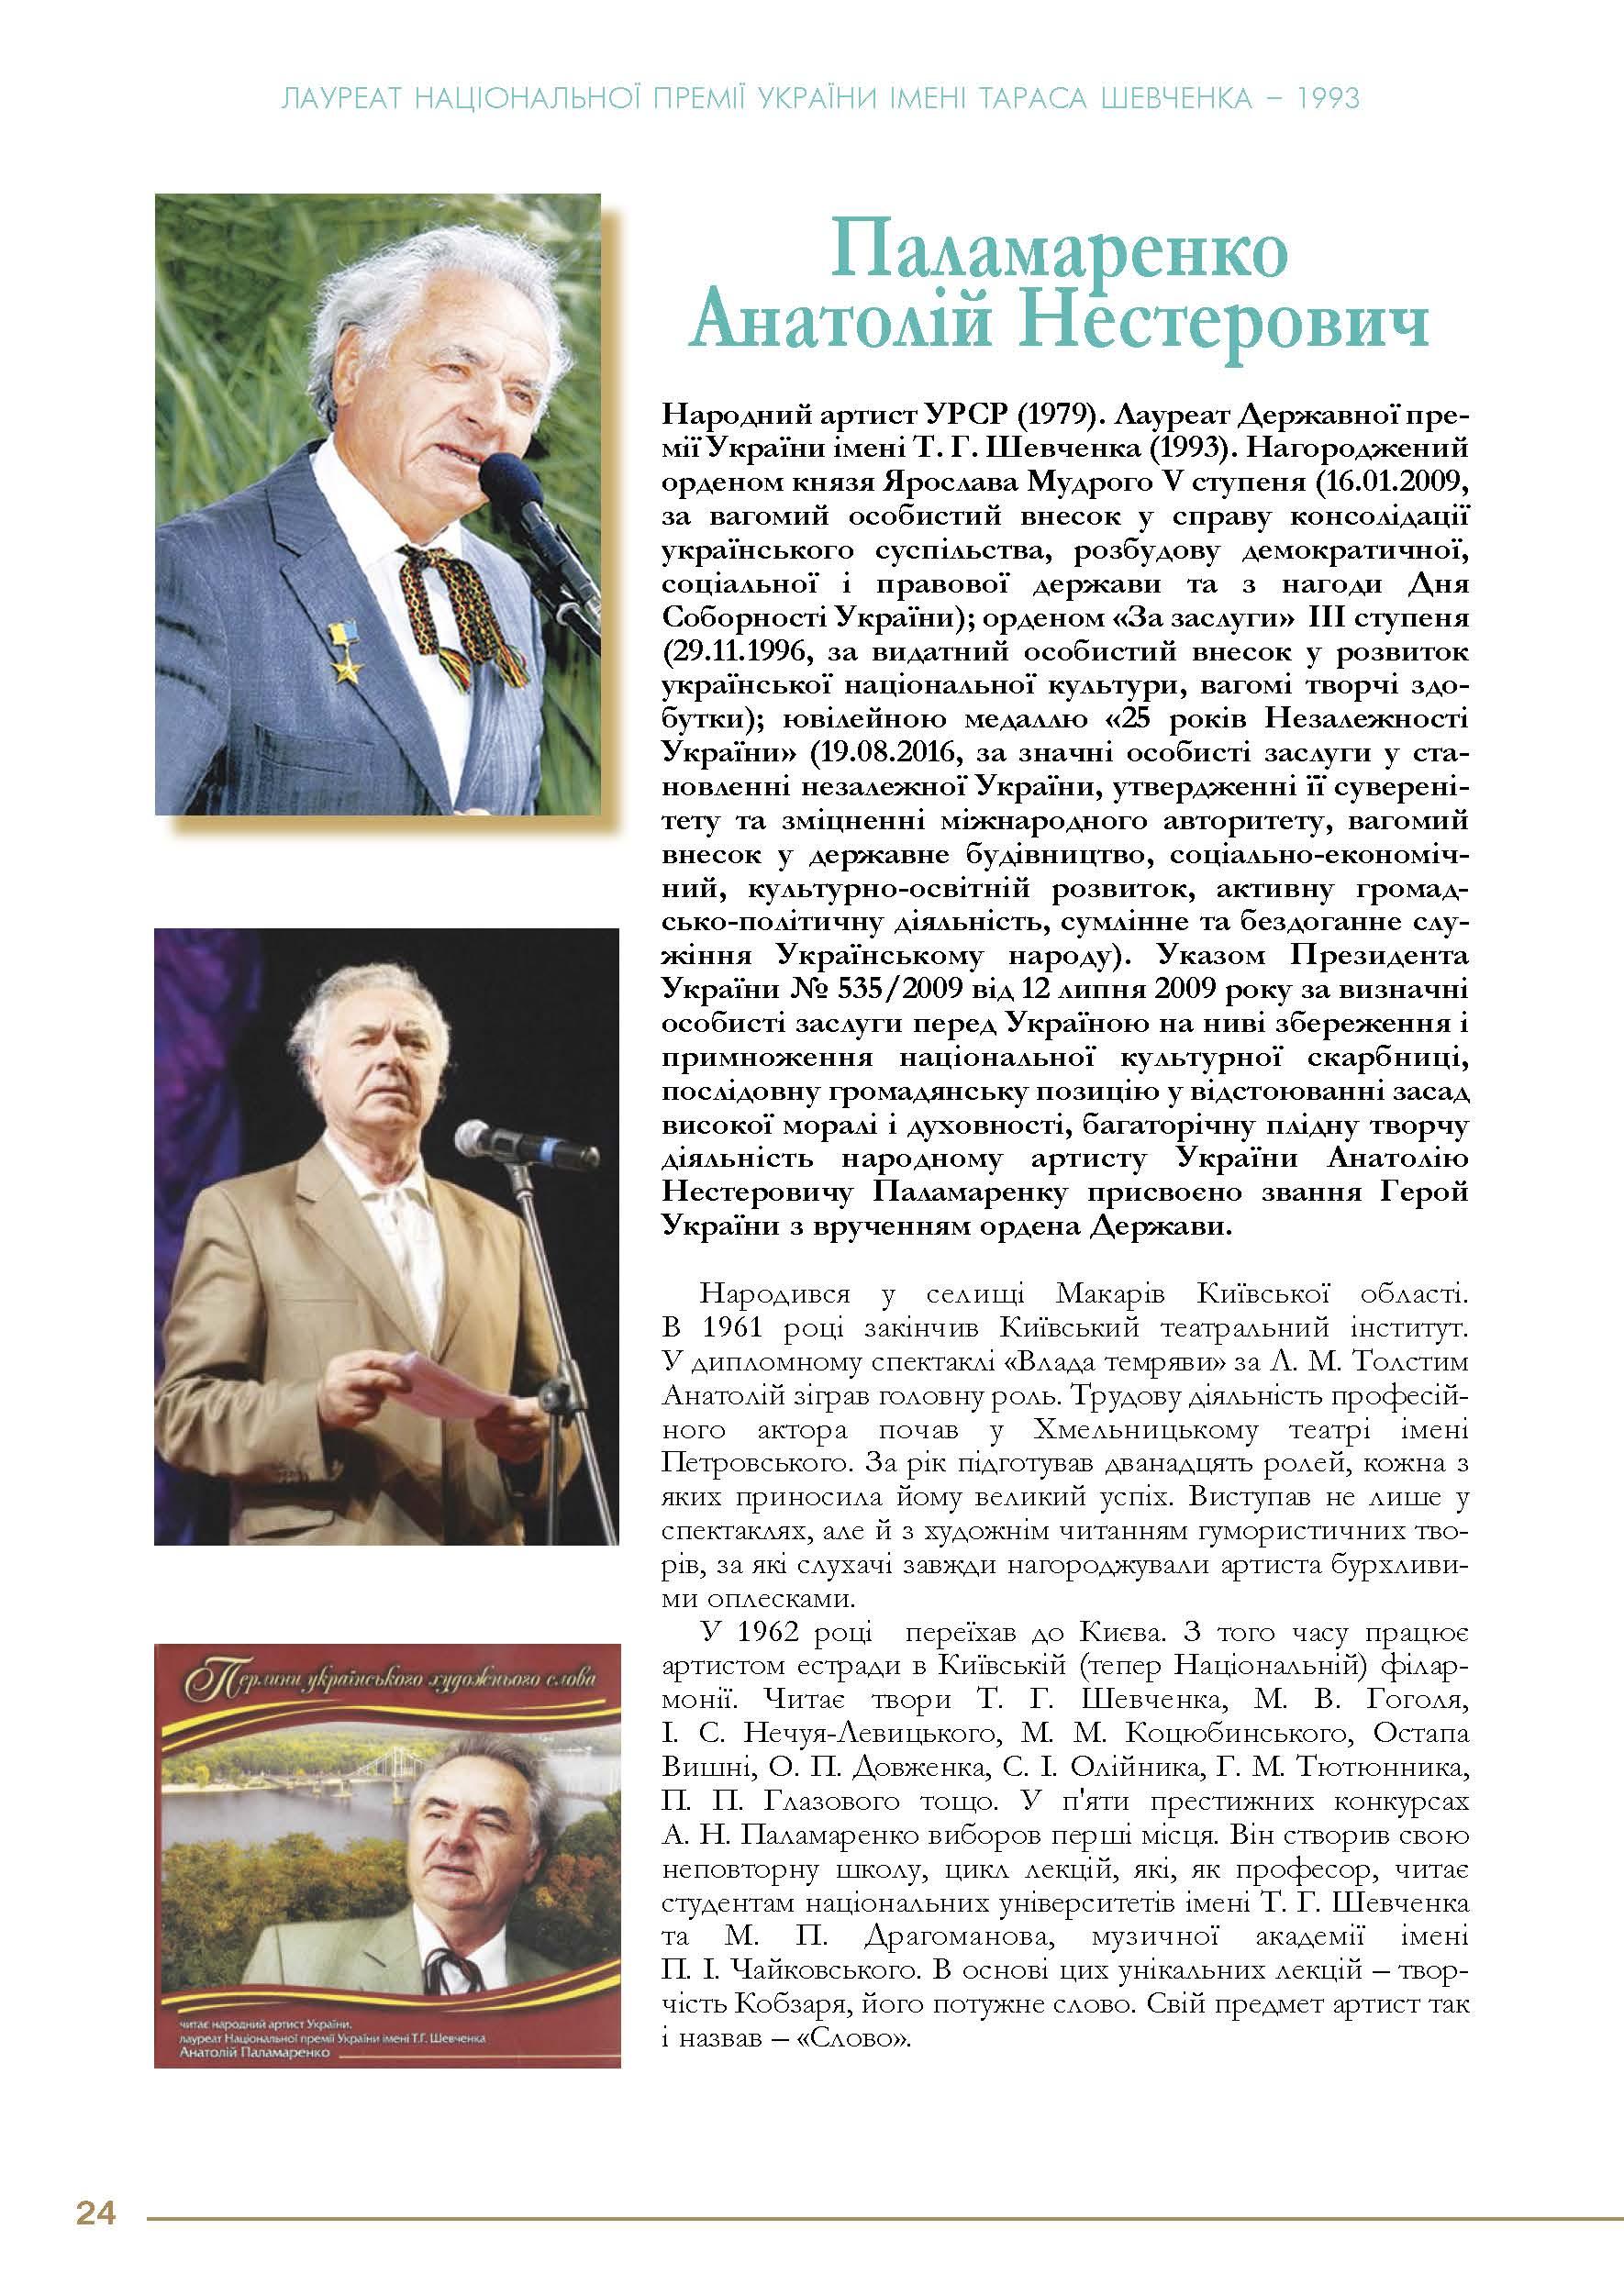 Паламаренко Анатолій Нестерович